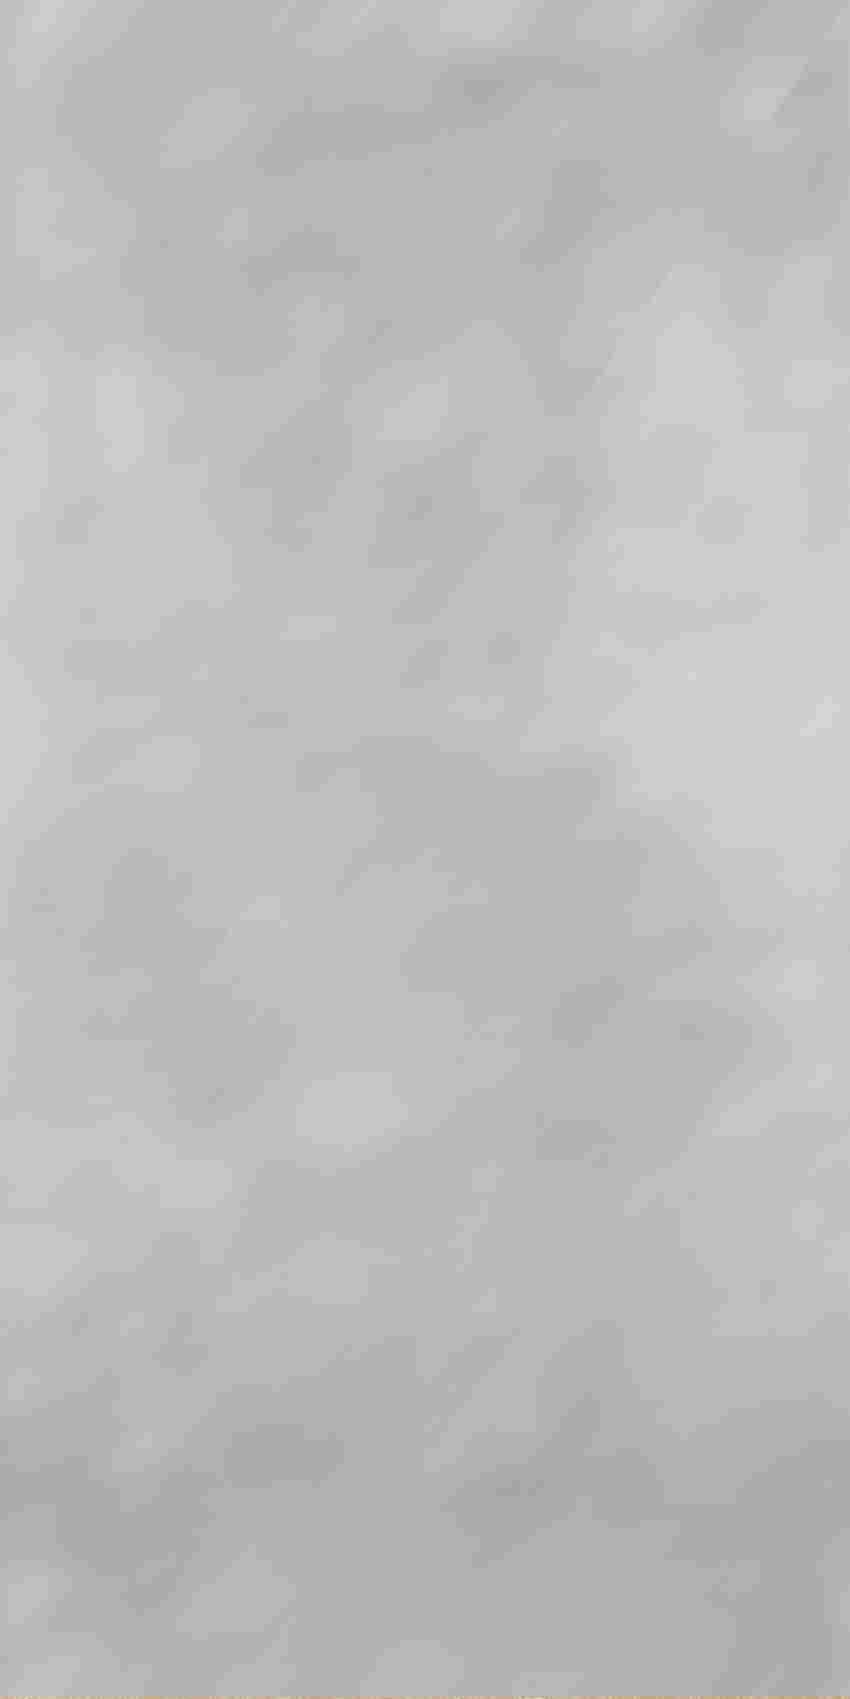 Płytka uniwersalna 30x60 cm Paradyż Flash Beige Gres Szkl. Mat.